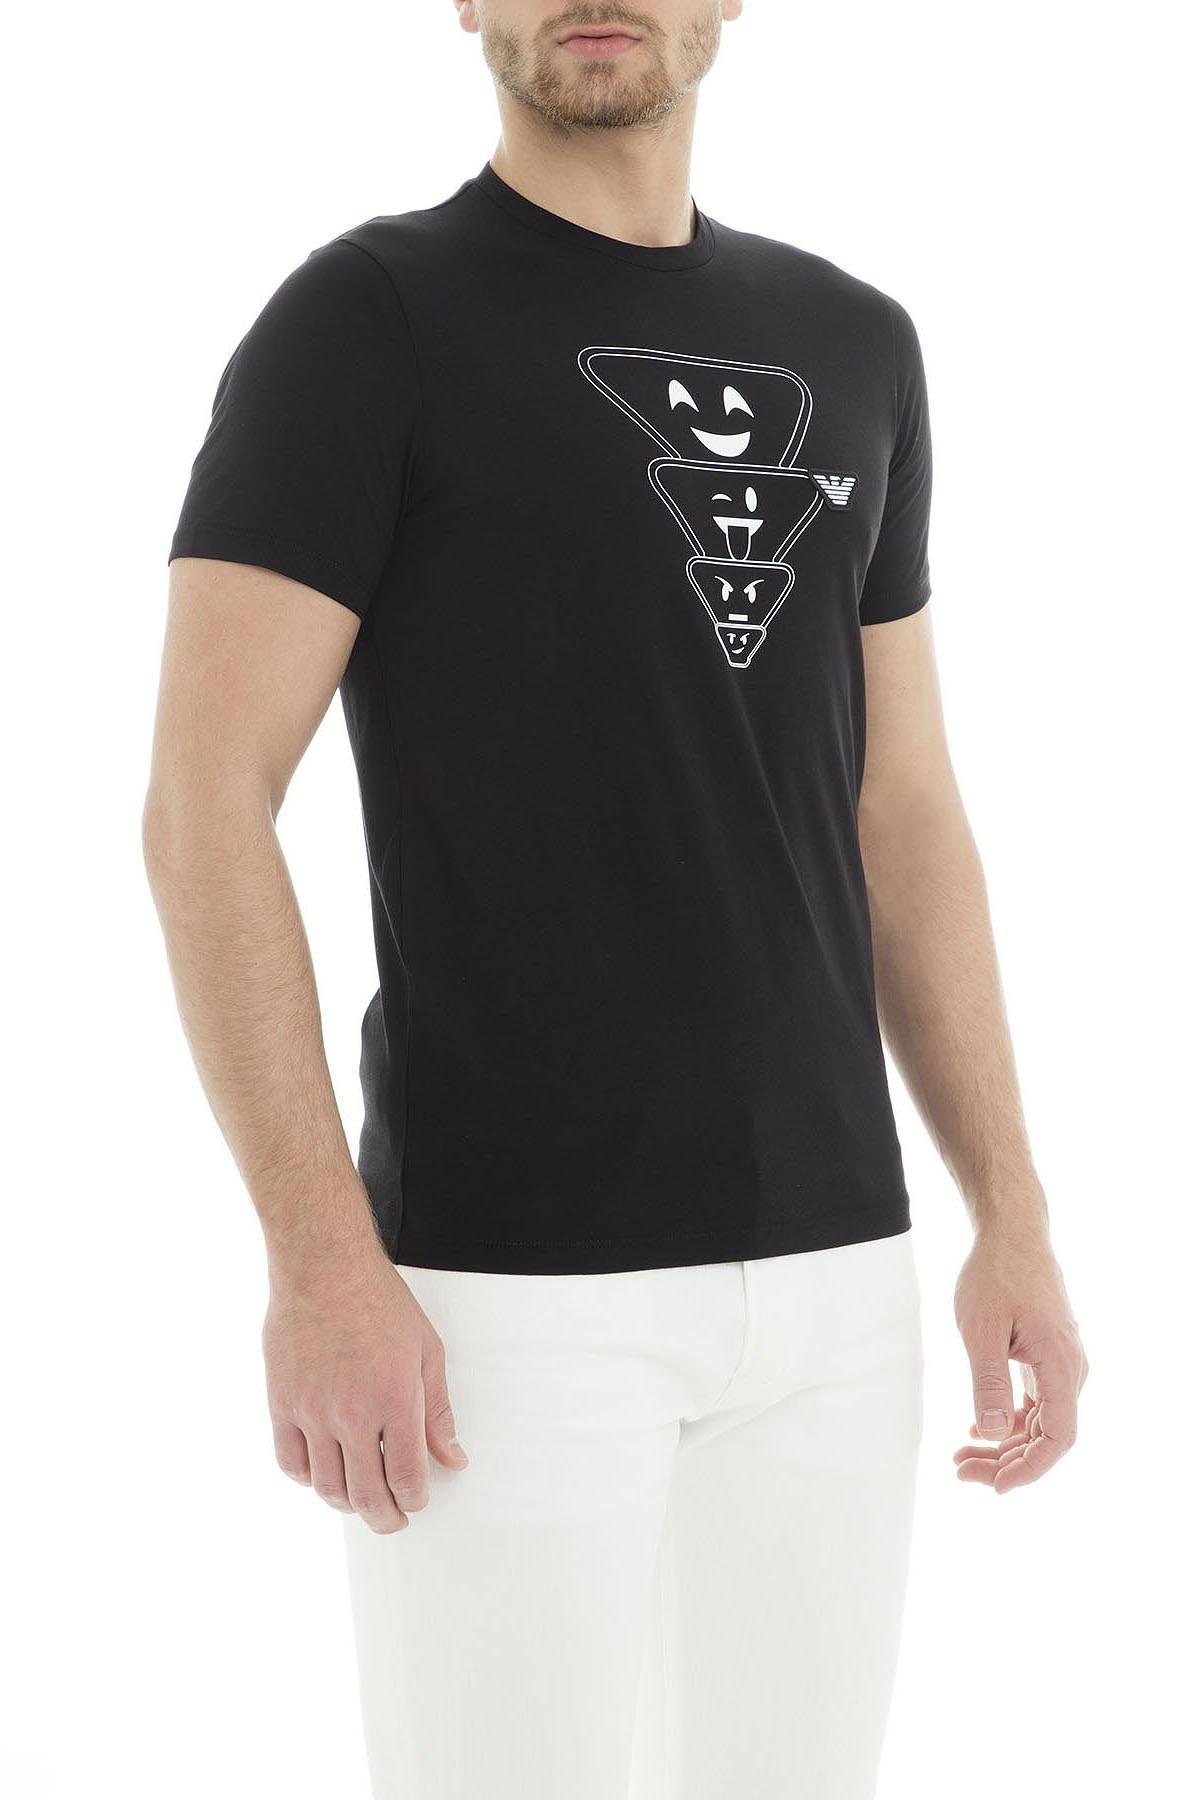 Emporio Armani Erkek T Shirt 6Z1TS2 1JQUZ 0999 SİYAH